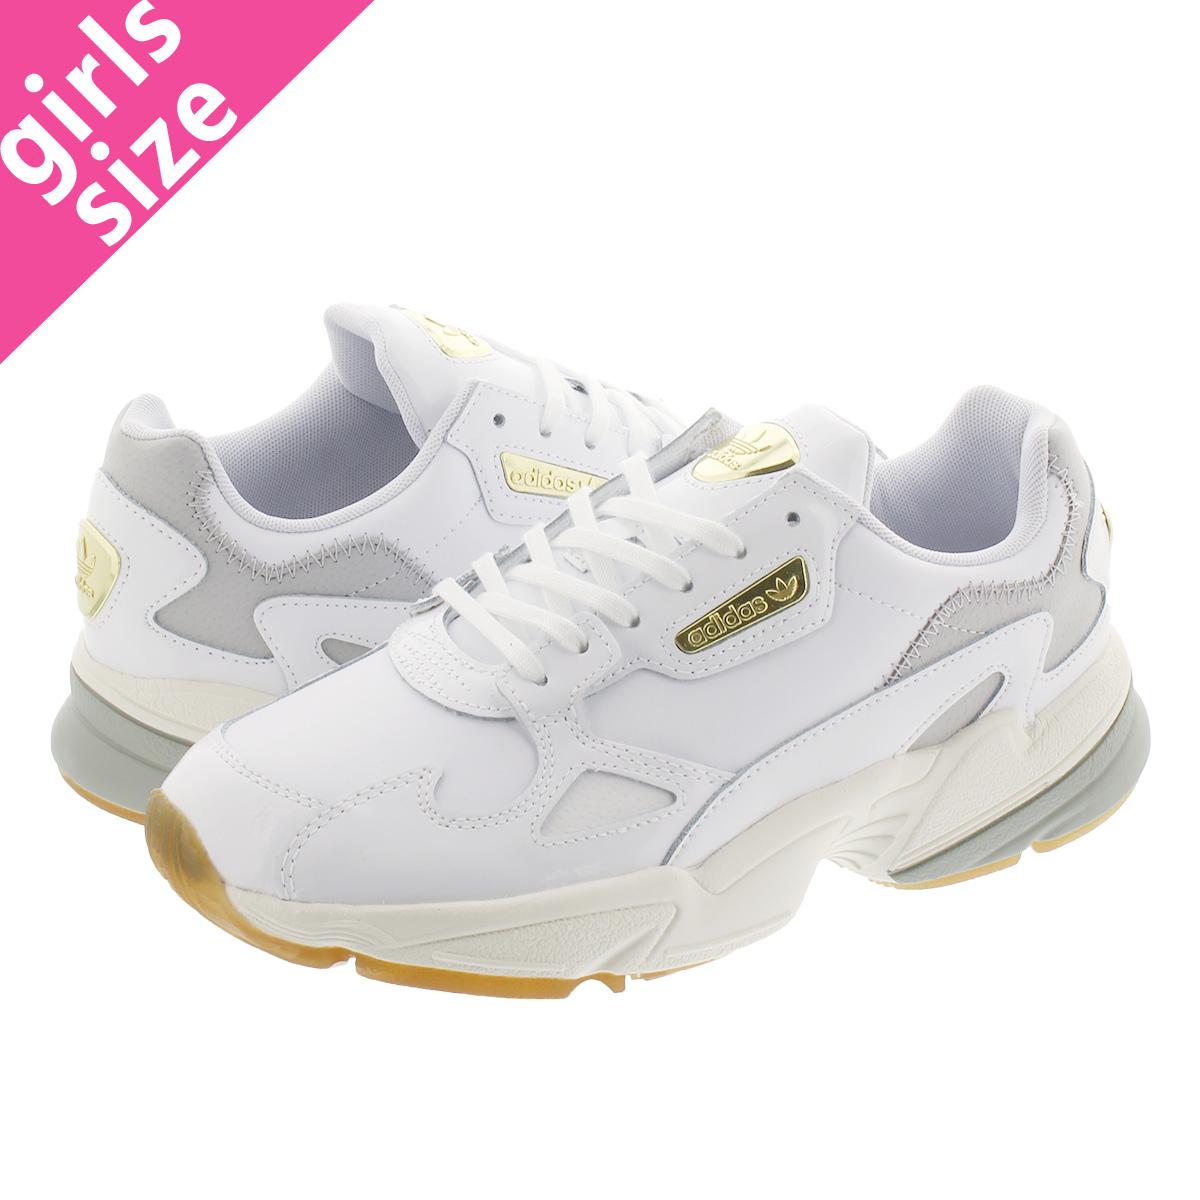 adidas ADIDASFALCON W アディダス アディダスファルコン ウィメンズ FTWR WHITE/OFF WHITE/GUM fv8279